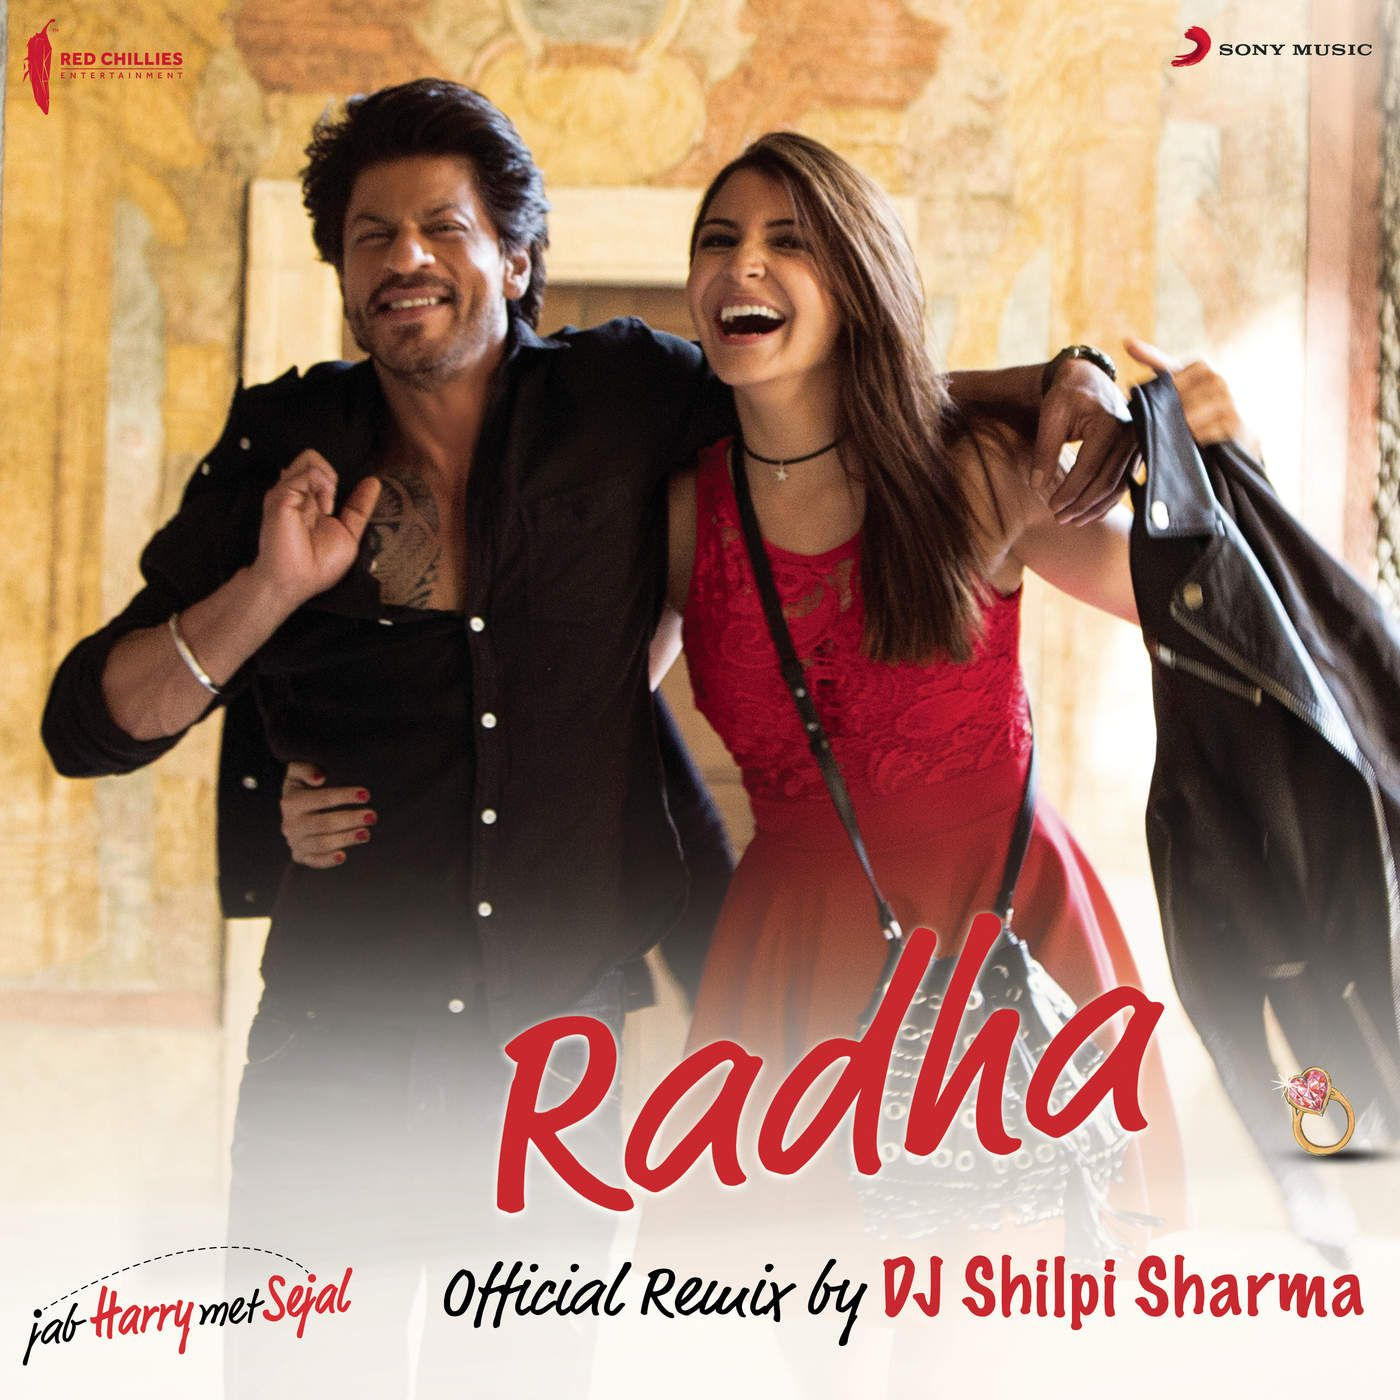 Radha Remix By Dj Shilpi Sharma Full Mp3 Song Download Song Radhasingers Sunidhi Chauhan Amp Shahid Mallyaremix Dj Shilpi Sh Dj Remix Mp3 Song Download